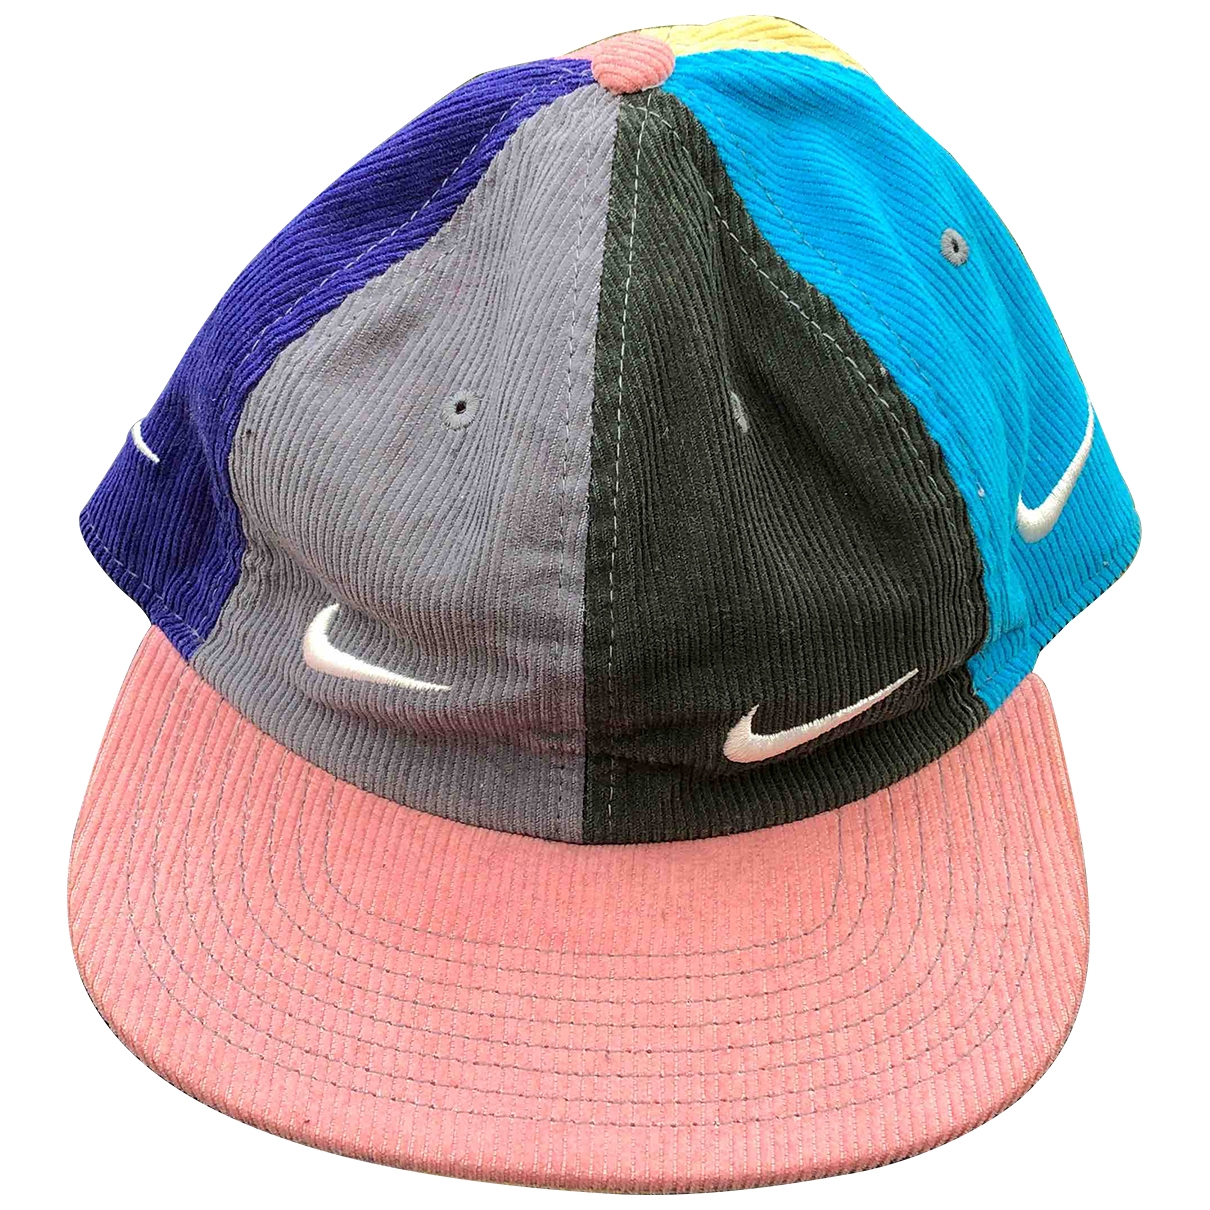 Nike \N Hut, Muetzen in  Bunt Baumwolle